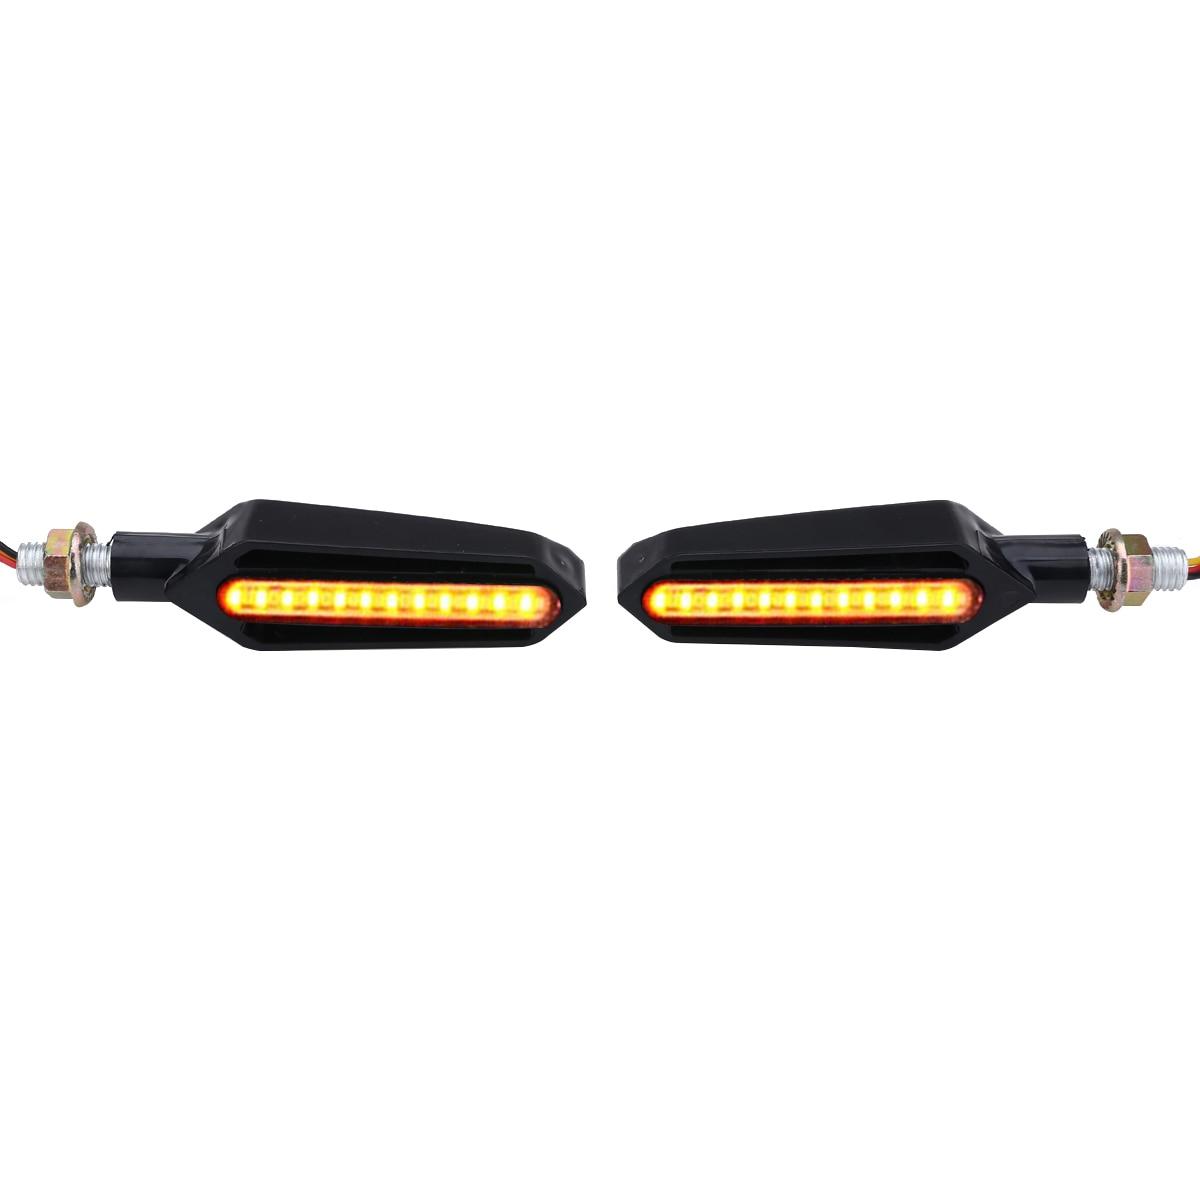 High Quality 1Pair 24LED Motorcycle DRL Water Flowing Turn Signal Indicator Brake Lights Blinker Flasher Lamp 12V DC Waterproof